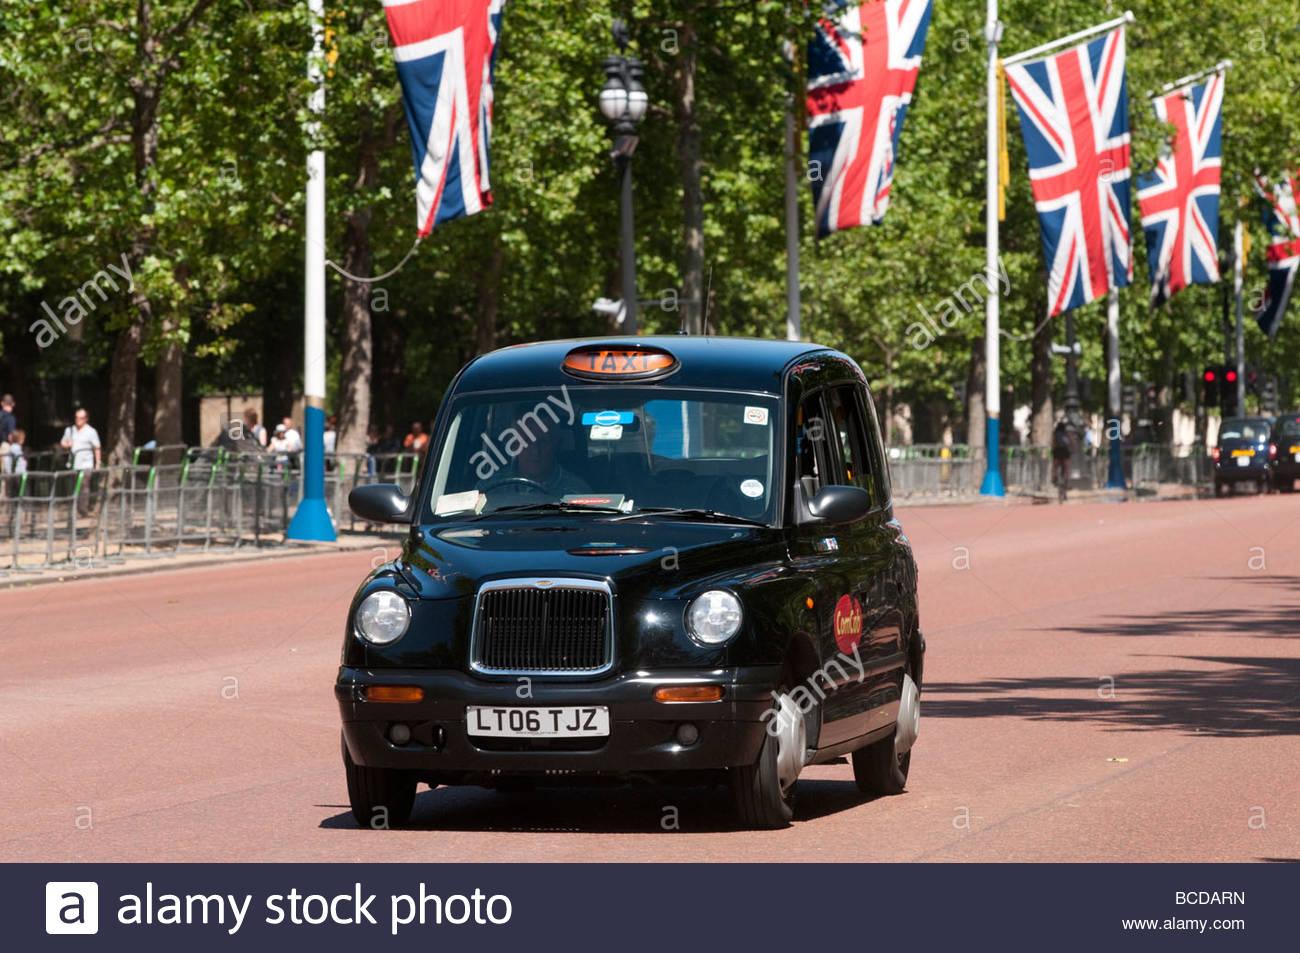 Taxi negro de Londres en el Mall, Inglaterra Imagen De Stock